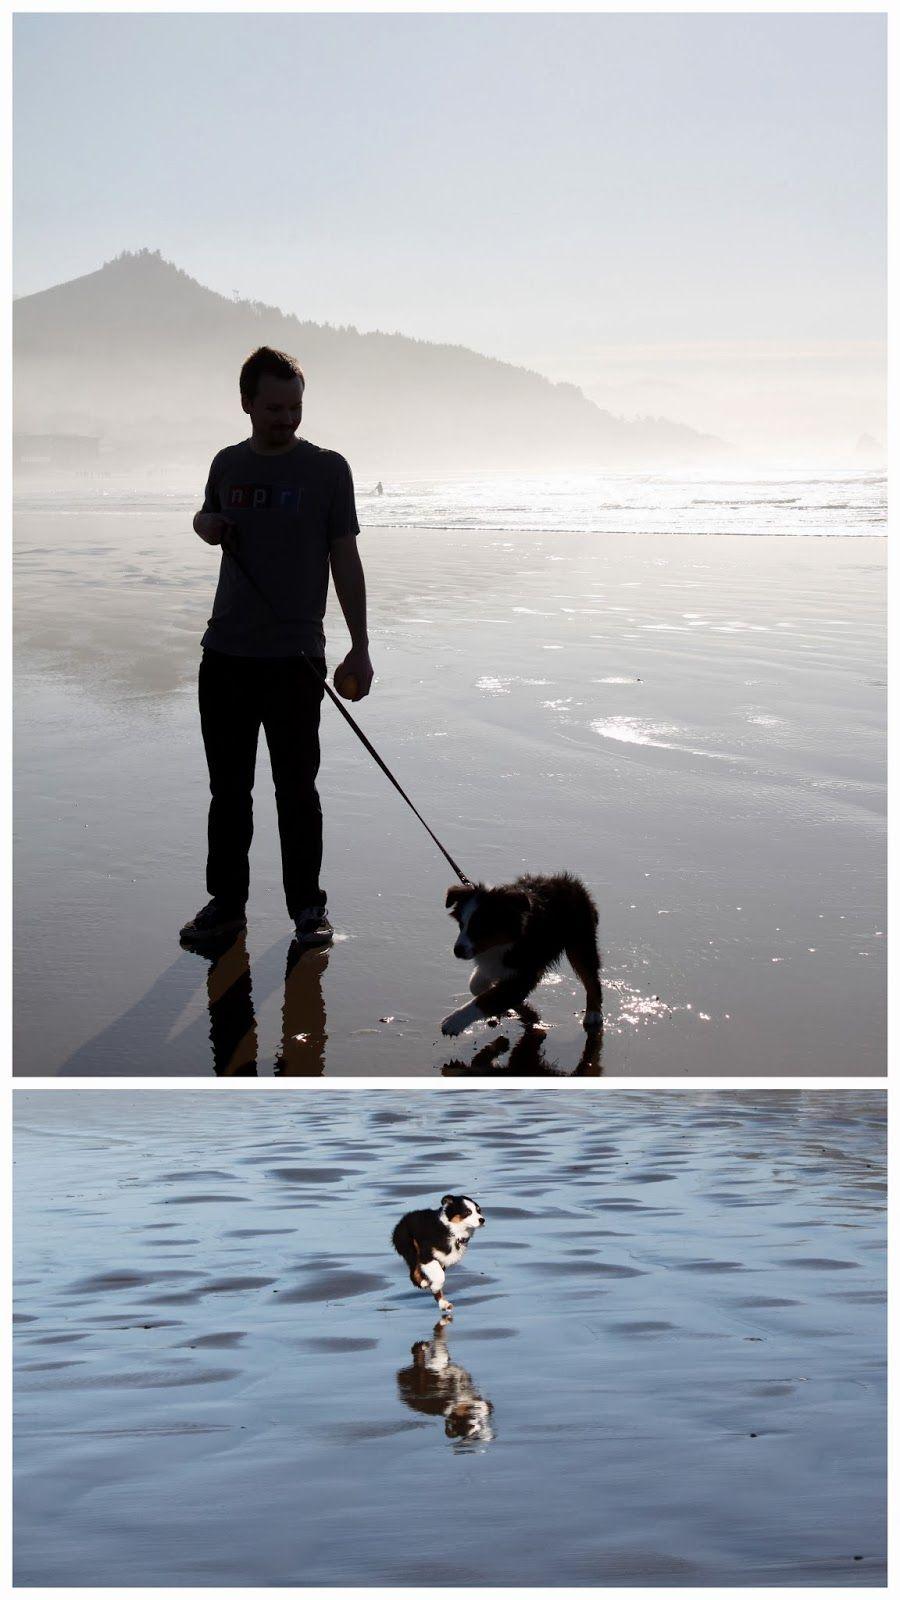 Cannon Beach, Oregon | Newlyweds in the Northwest  #CannonBeach #Oregon #Olive #Aussie #AustralianShepherd #Puppy